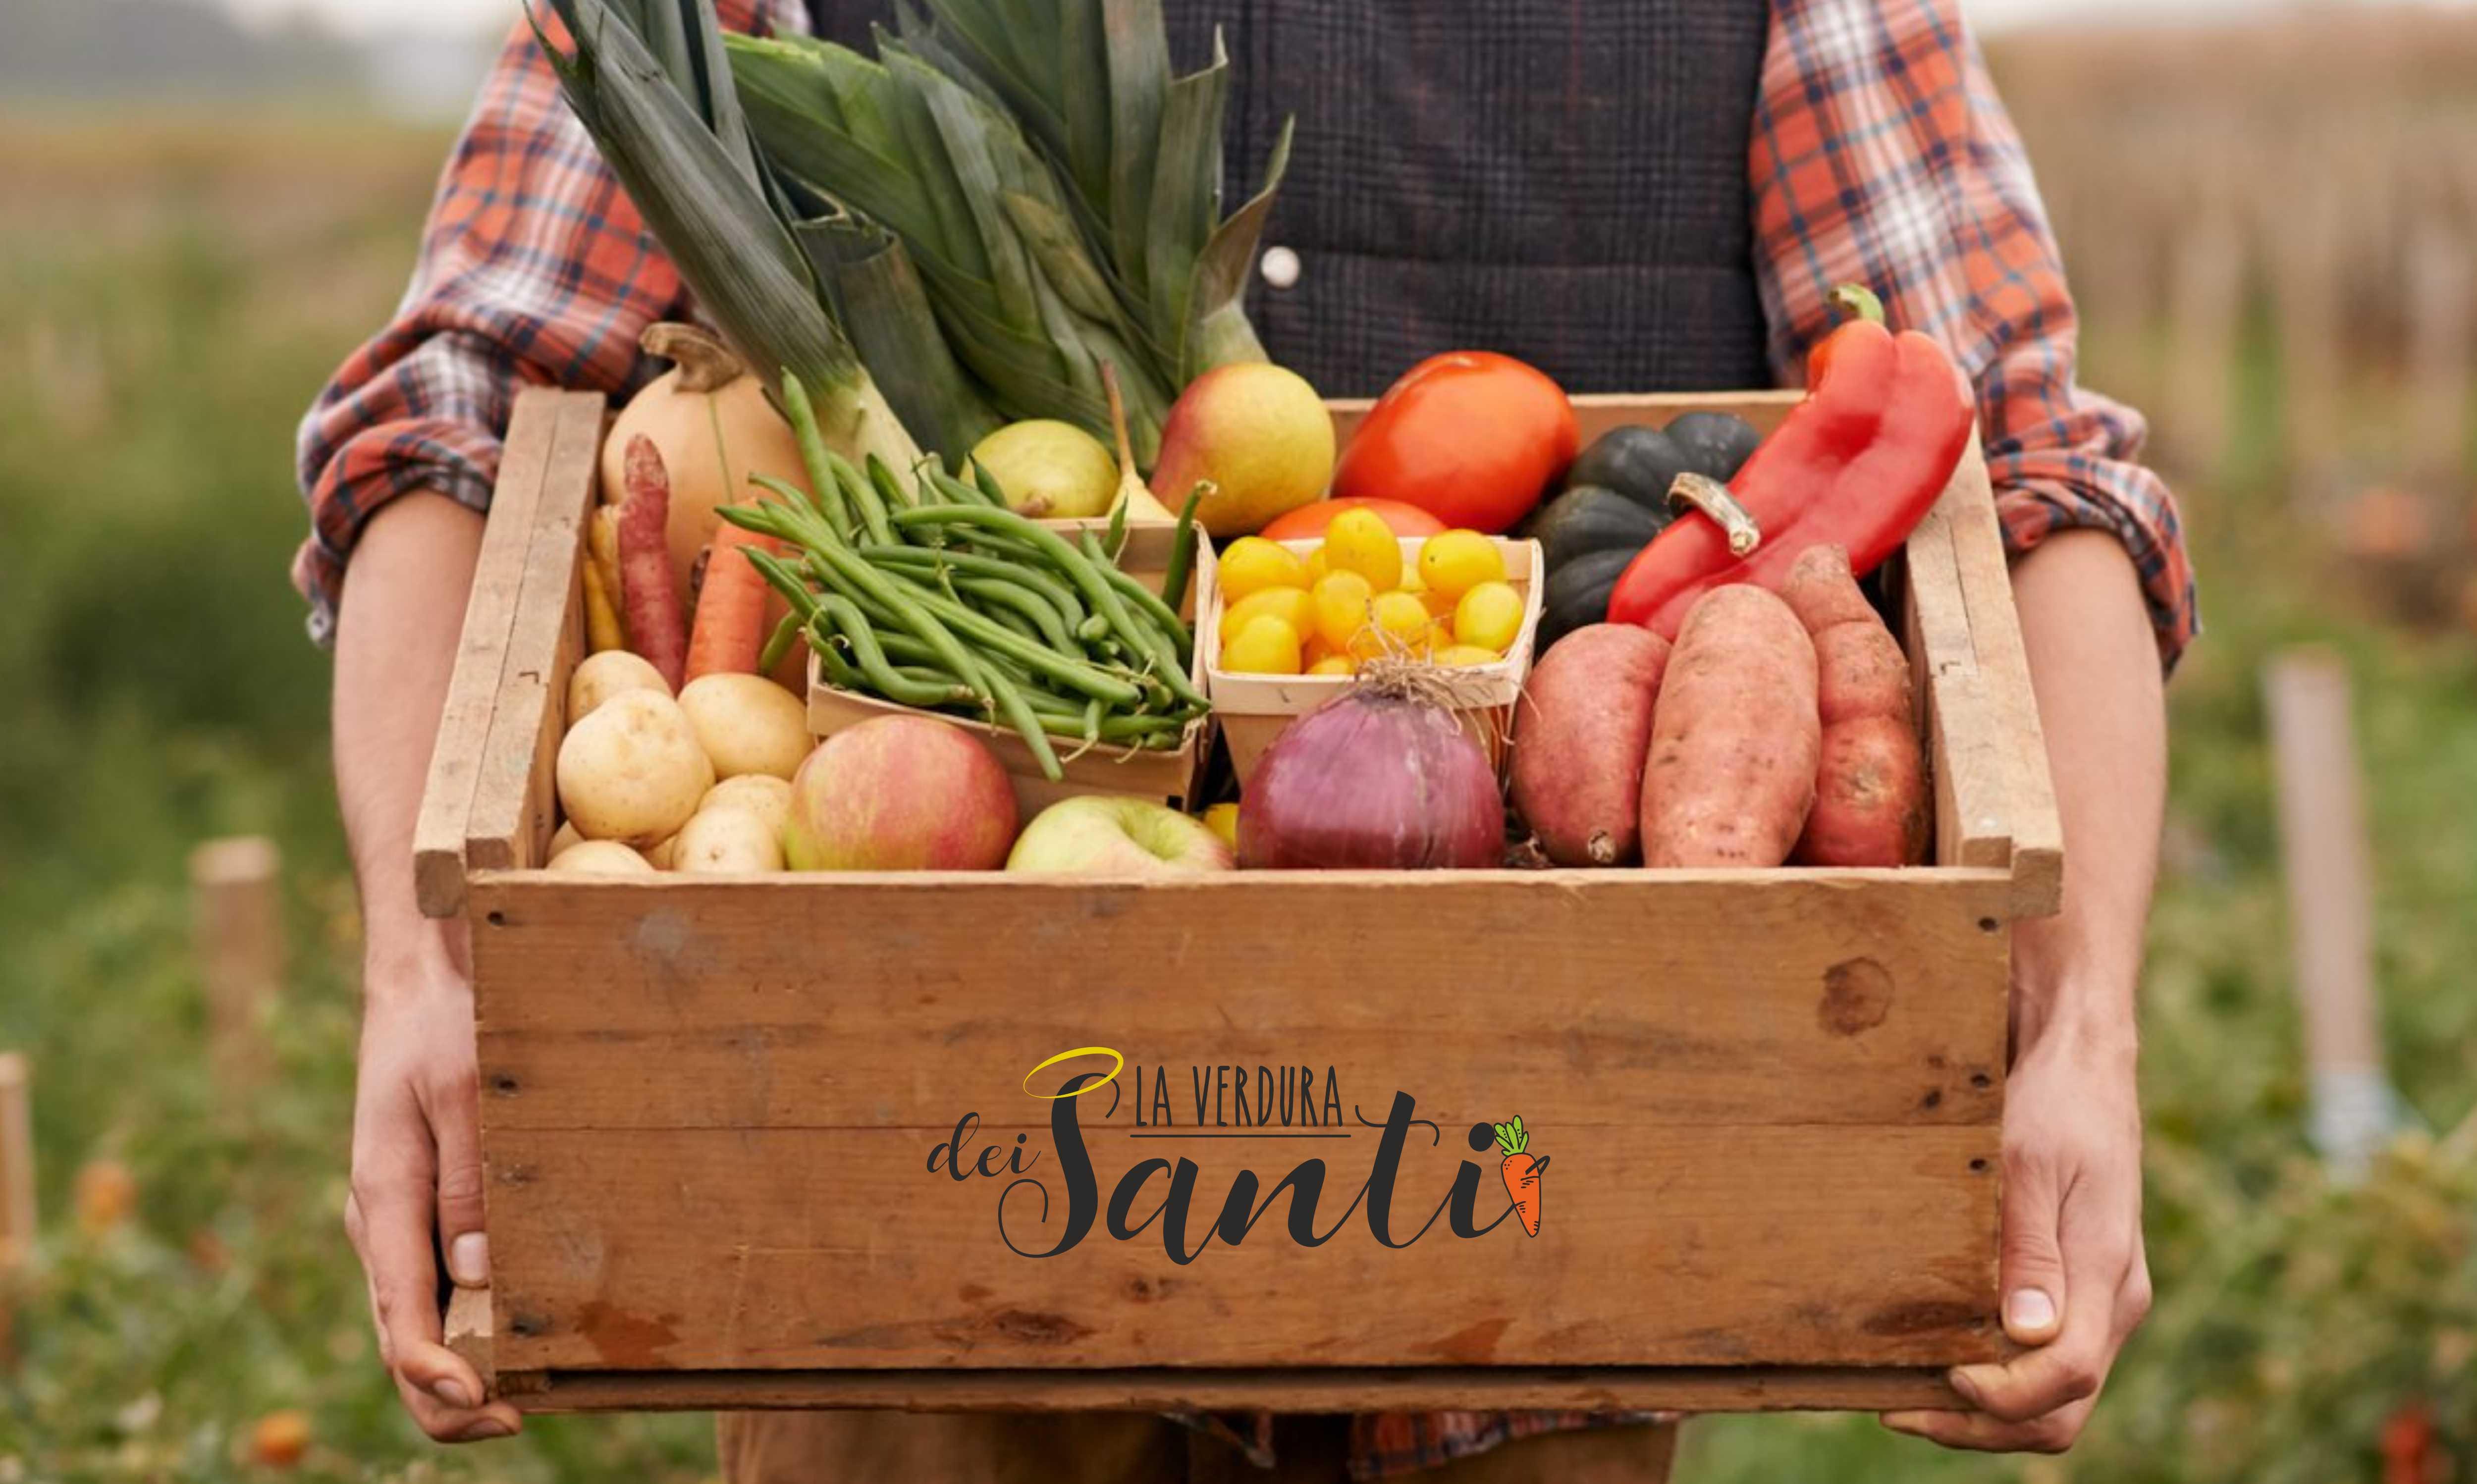 Frutta e verdura a casa, perché conviene?